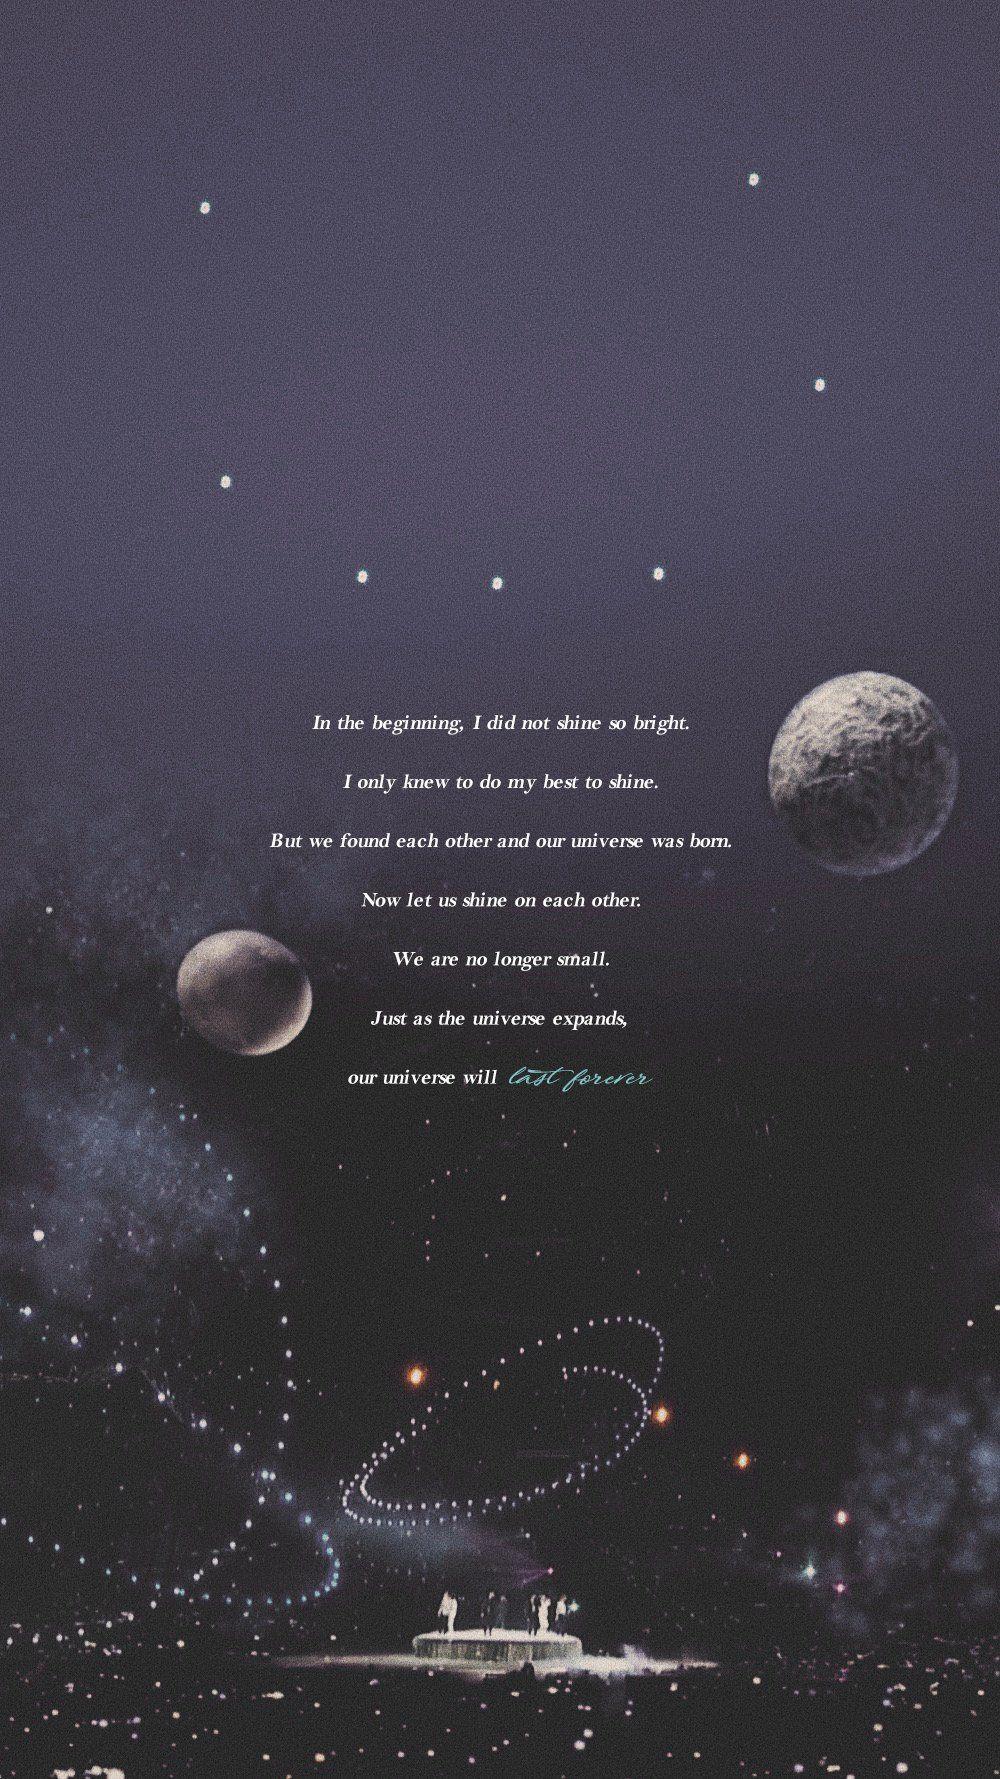 Aesthetic dark bts quotes wallpaper